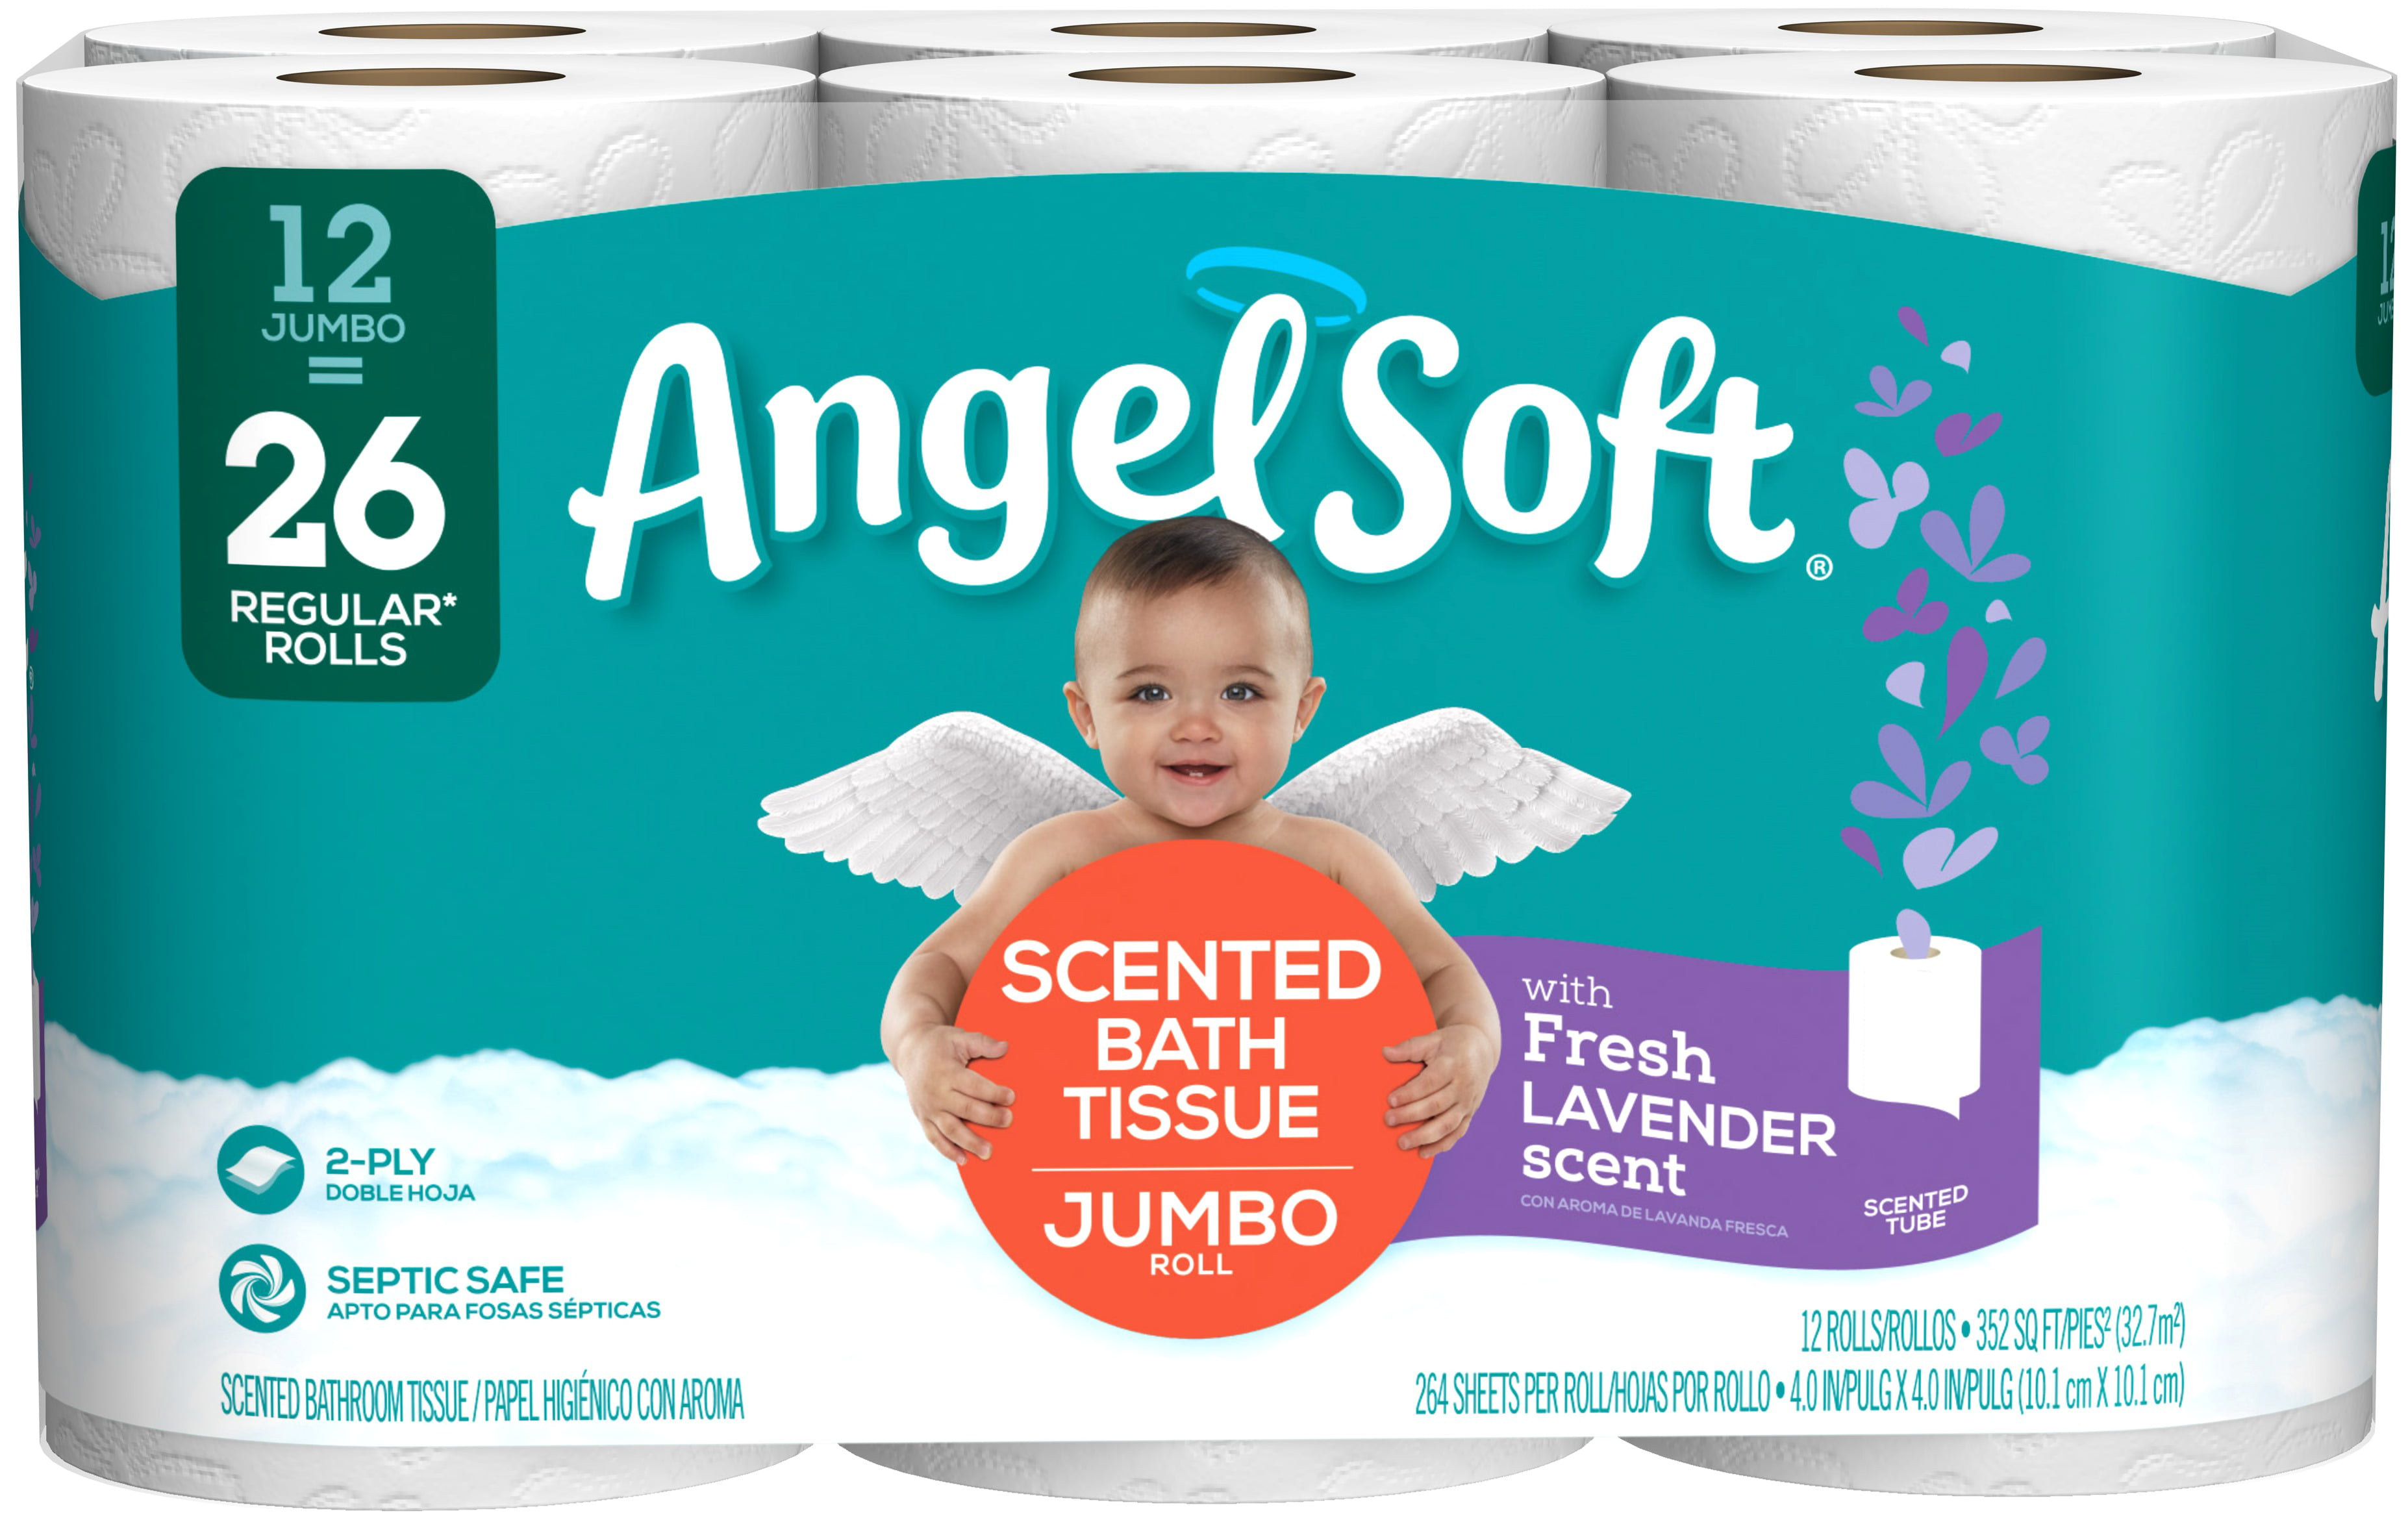 Angel Soft Toilet Paper With Fresh Lavender Scent 12 Jumbo Rolls Walmart Com Walmart Com